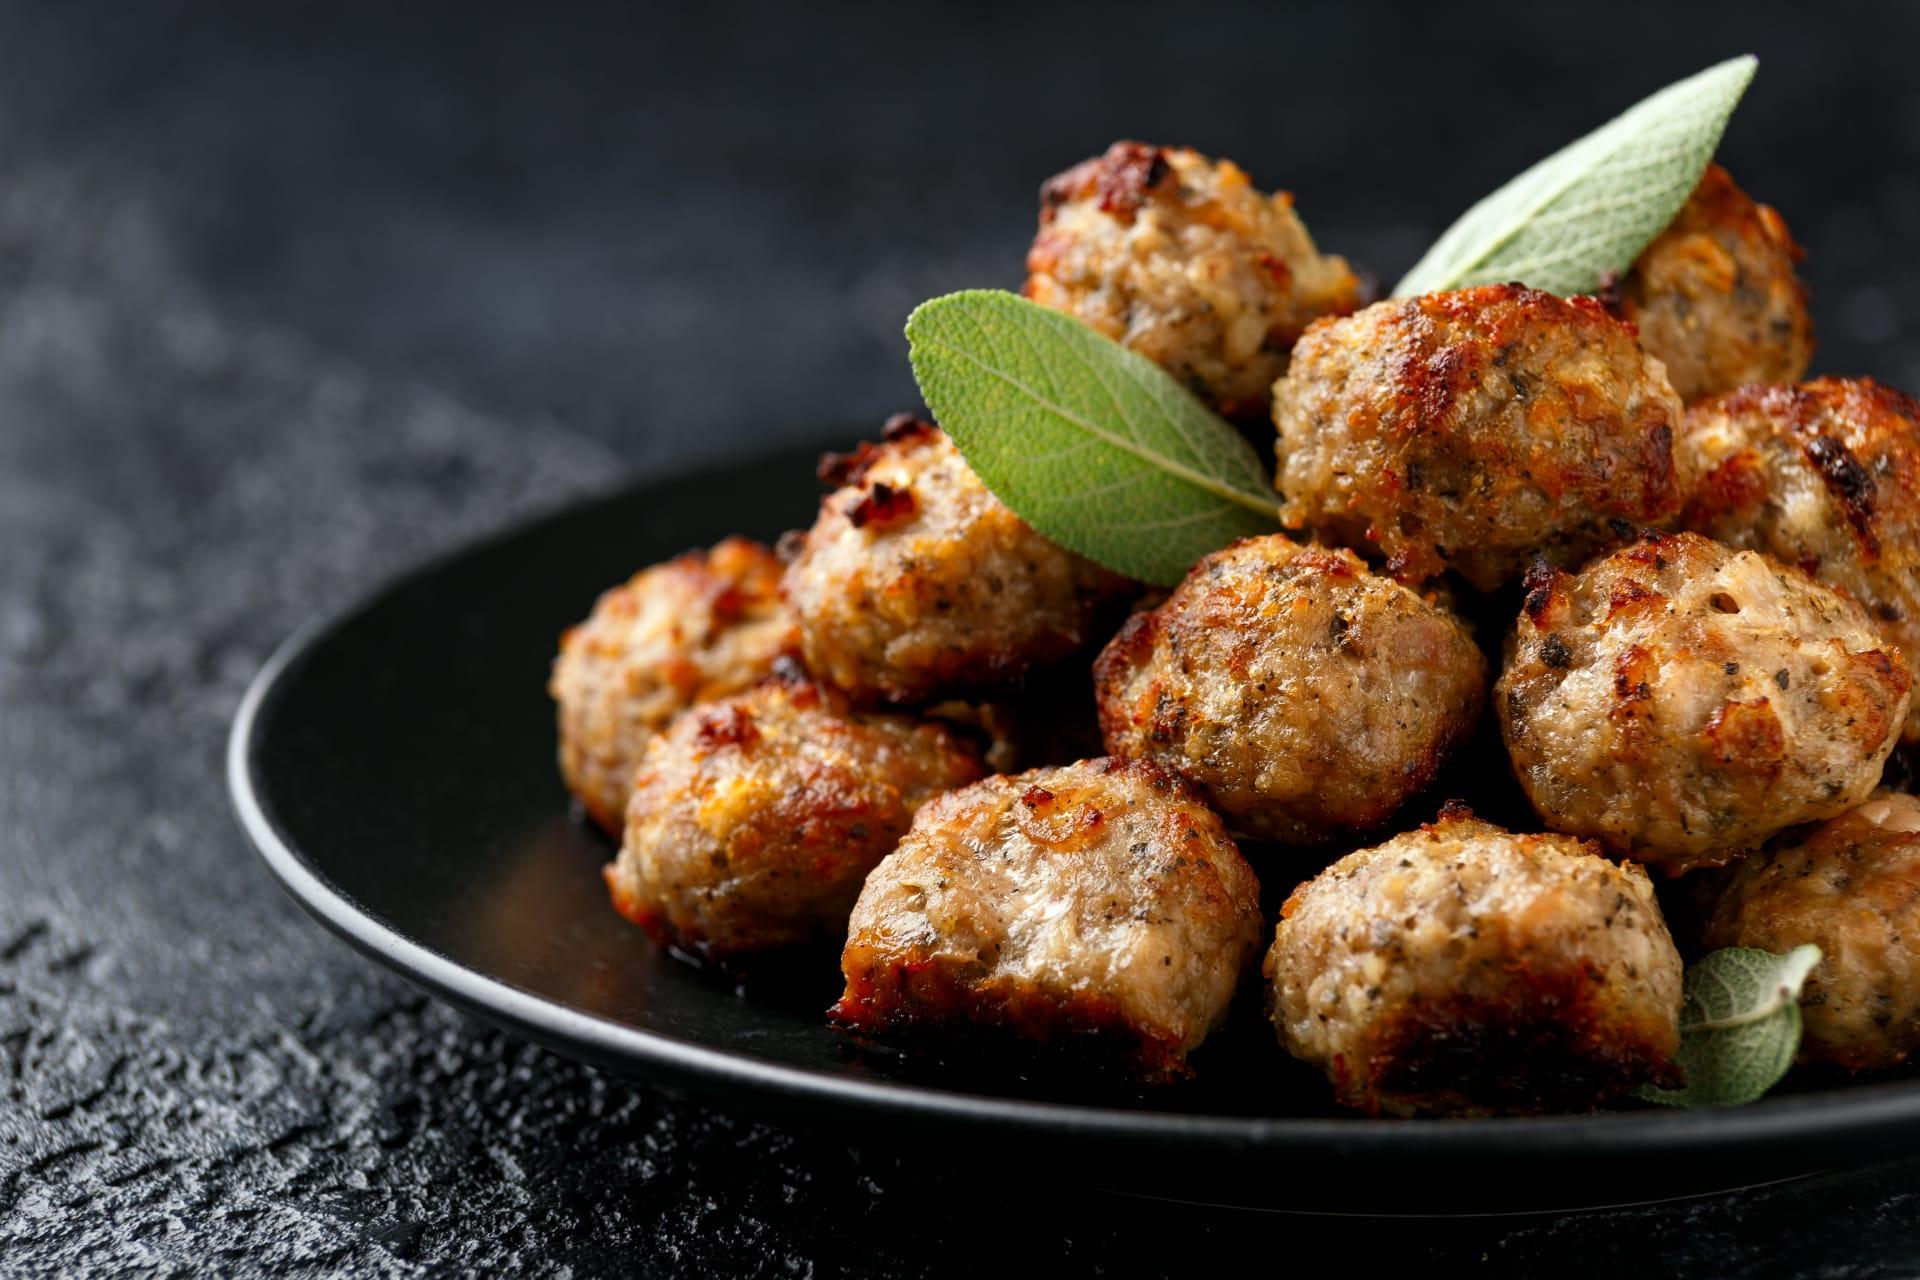 Rome - Polpette - Fried Meatballs